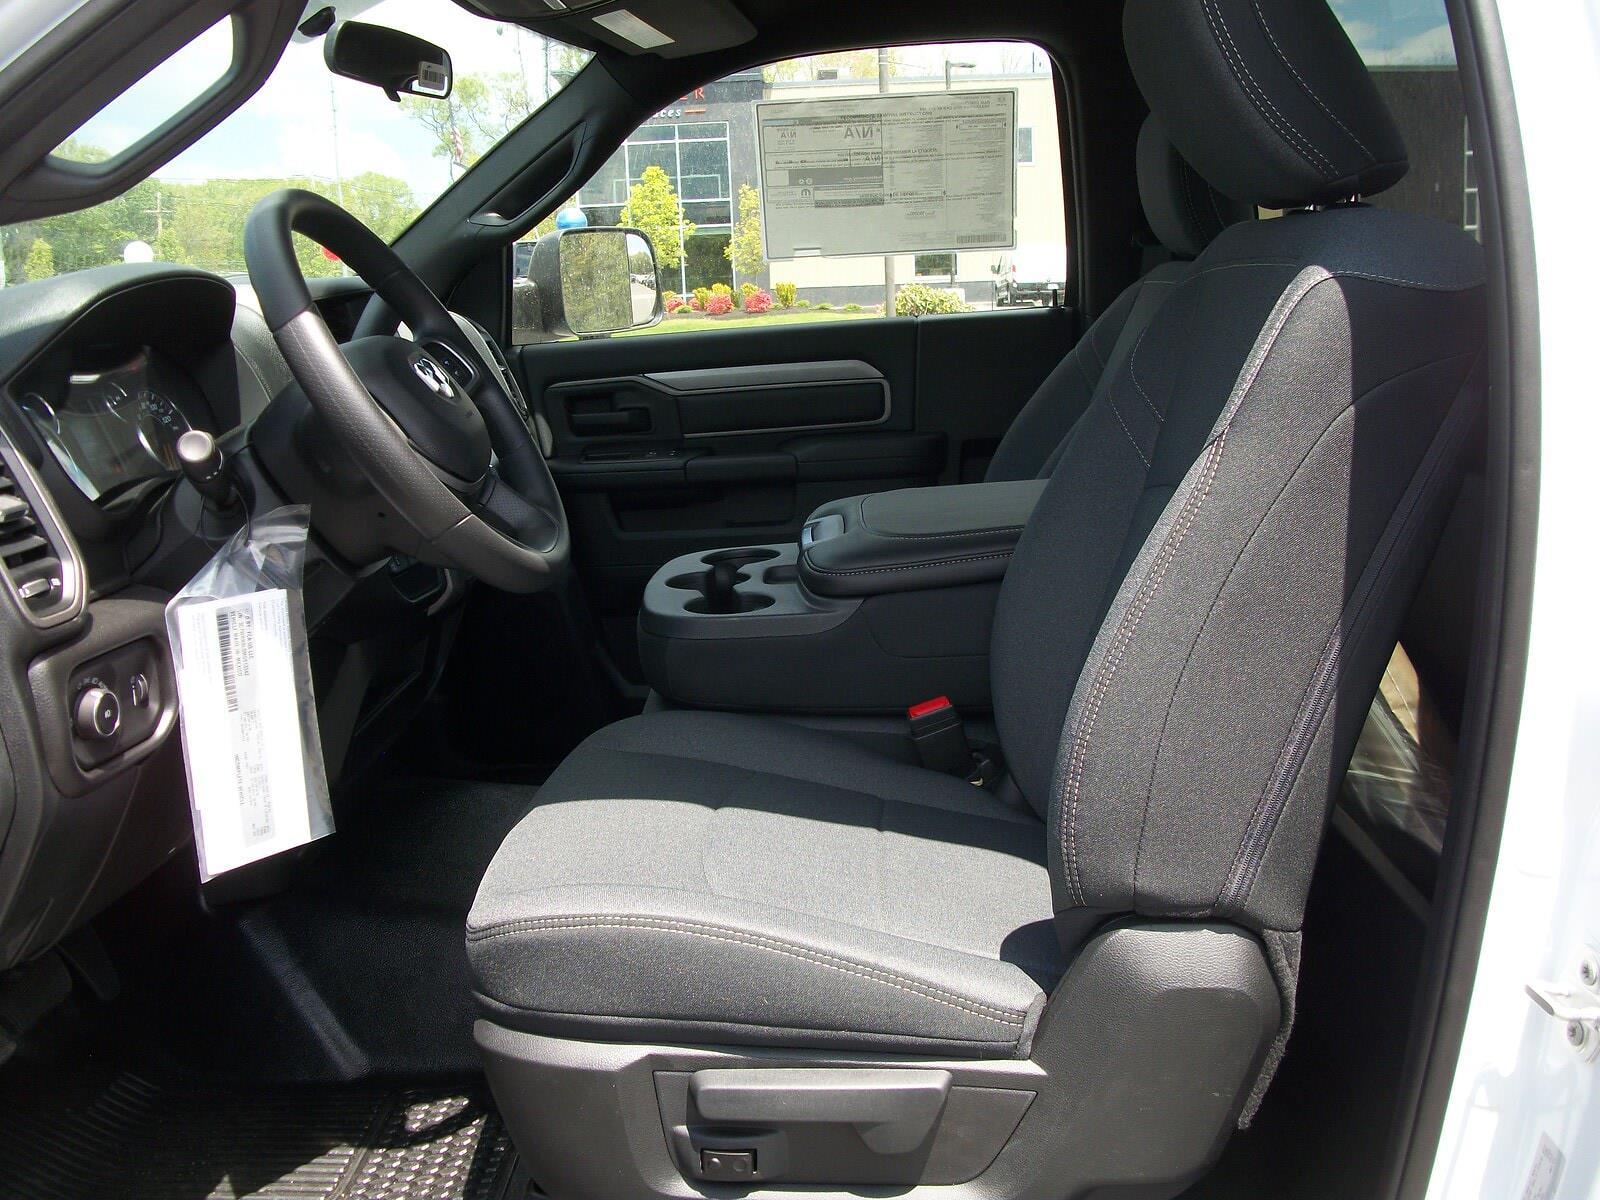 2021 Ram 5500 Regular Cab DRW 4x4,  Cab Chassis #21590 - photo 10